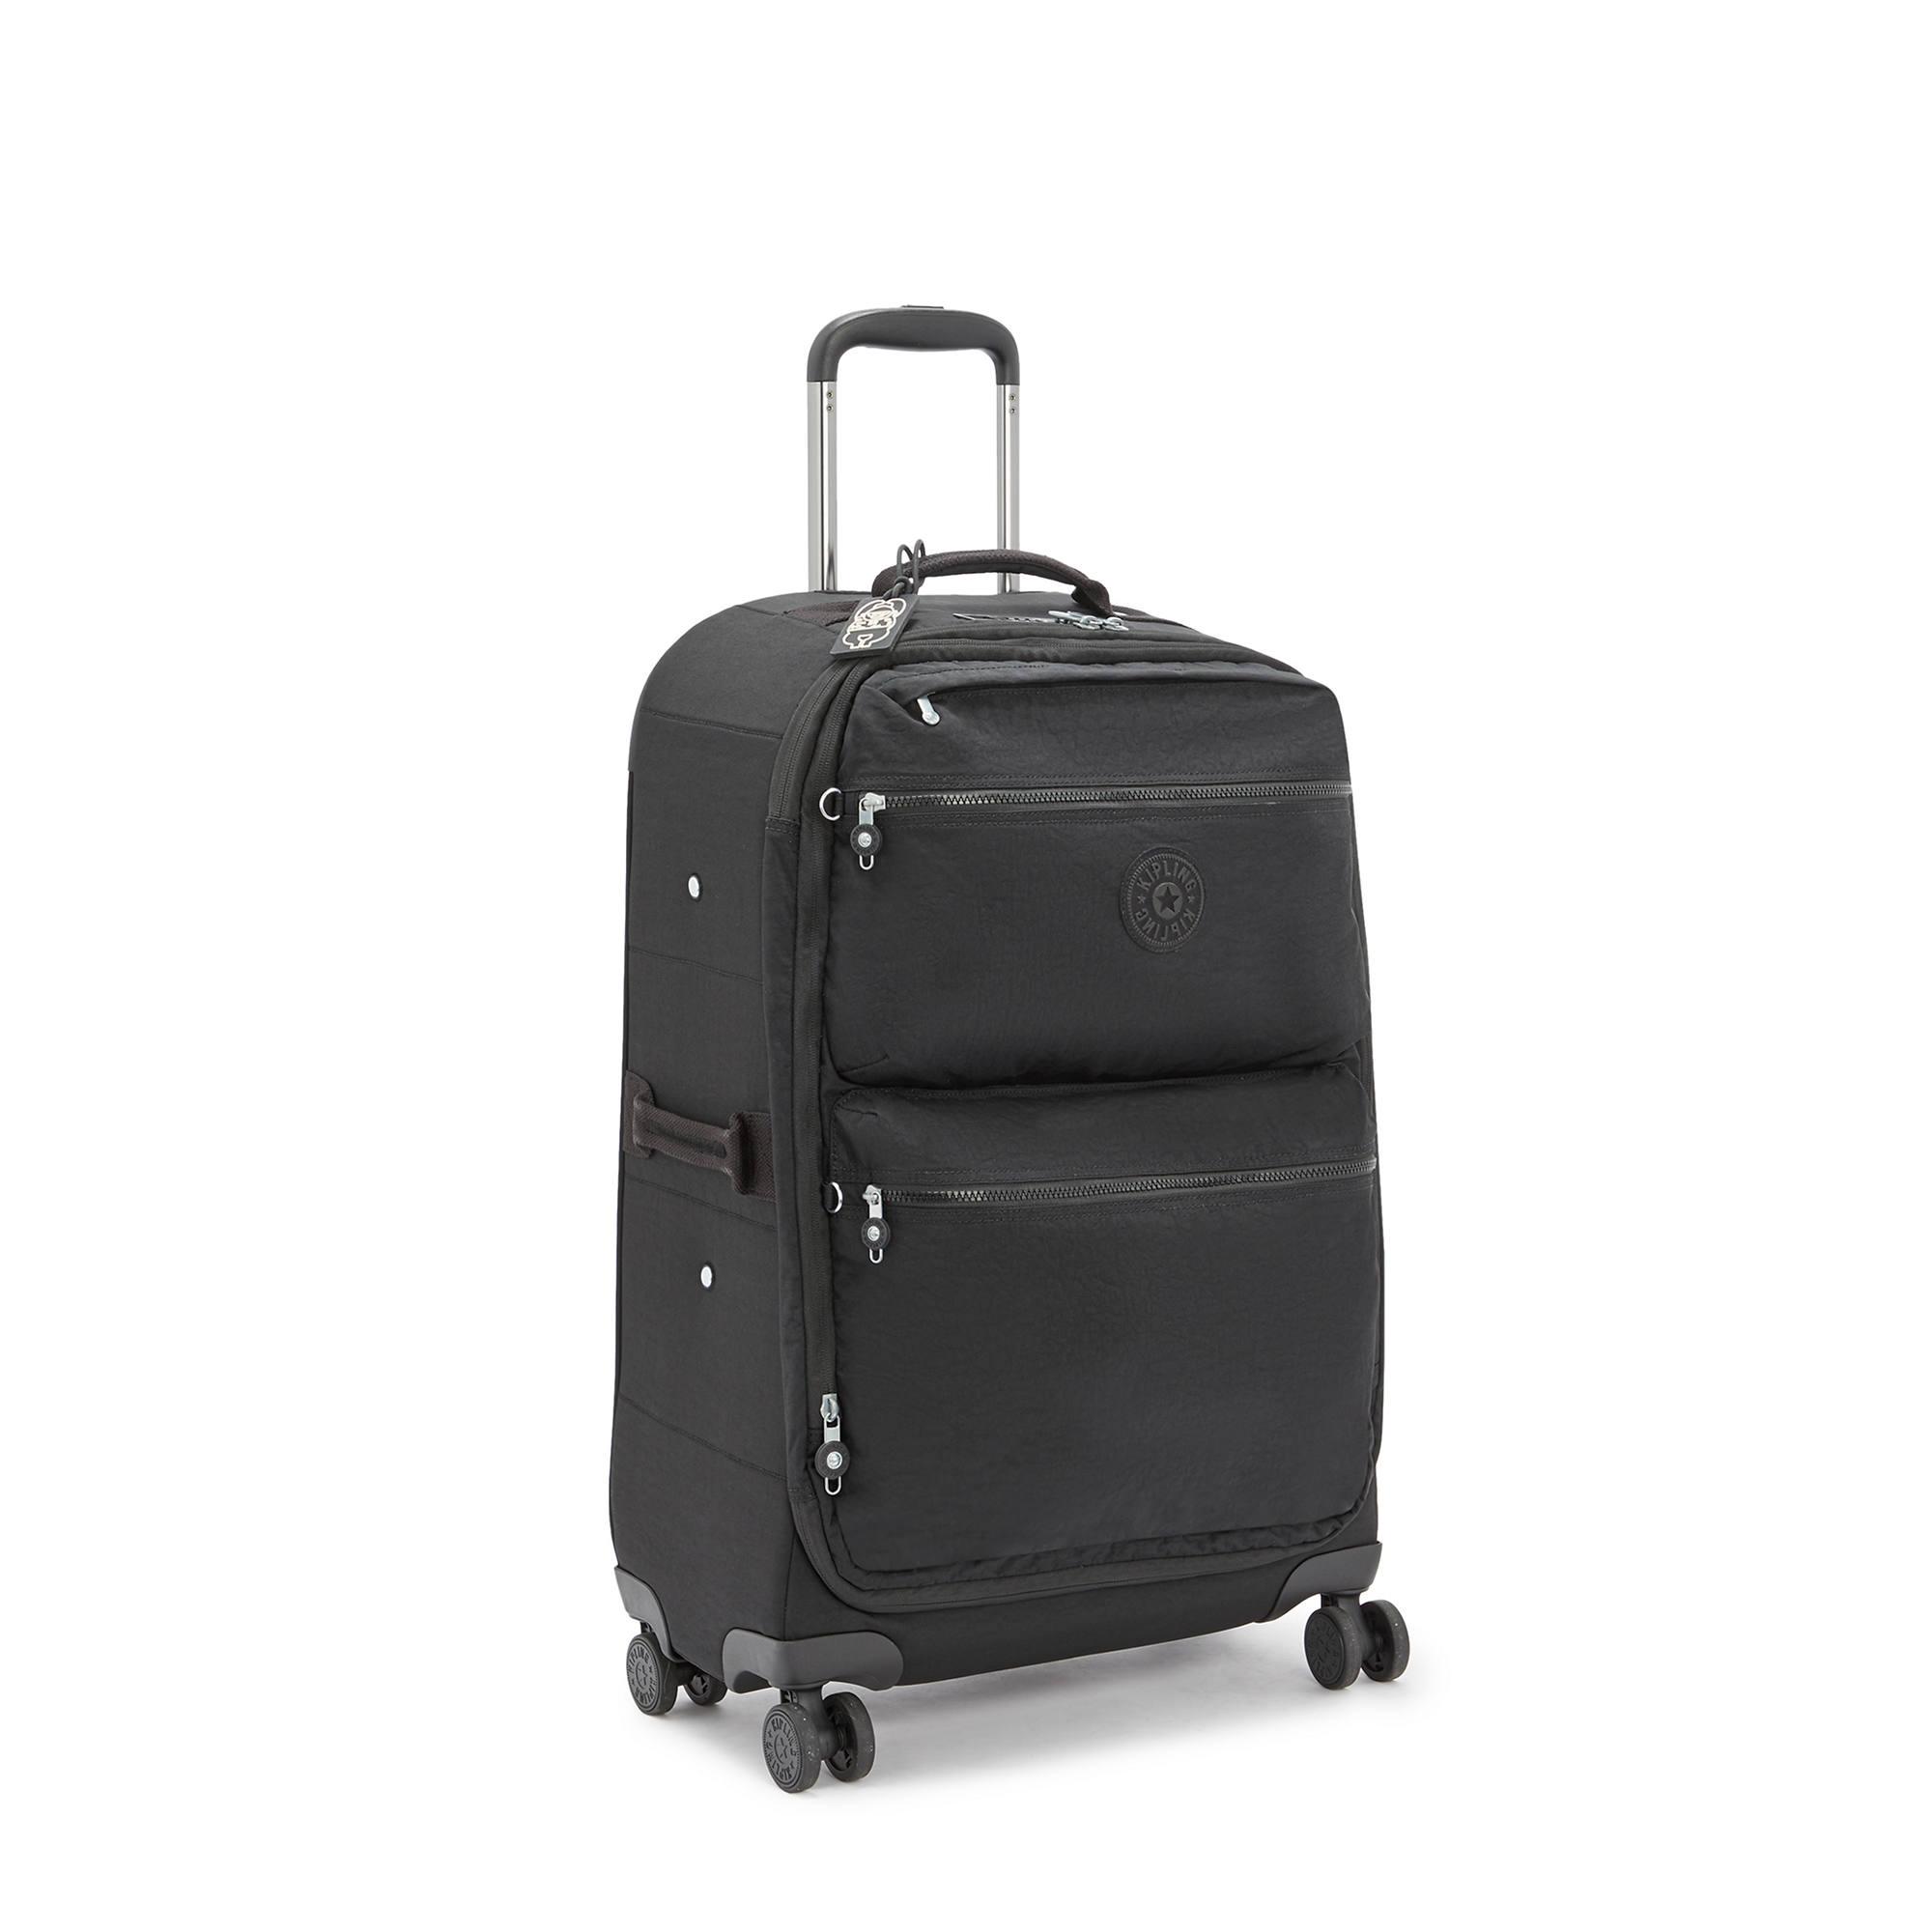 thumbnail 8 - Kipling City Spinner Medium Rolling Luggage